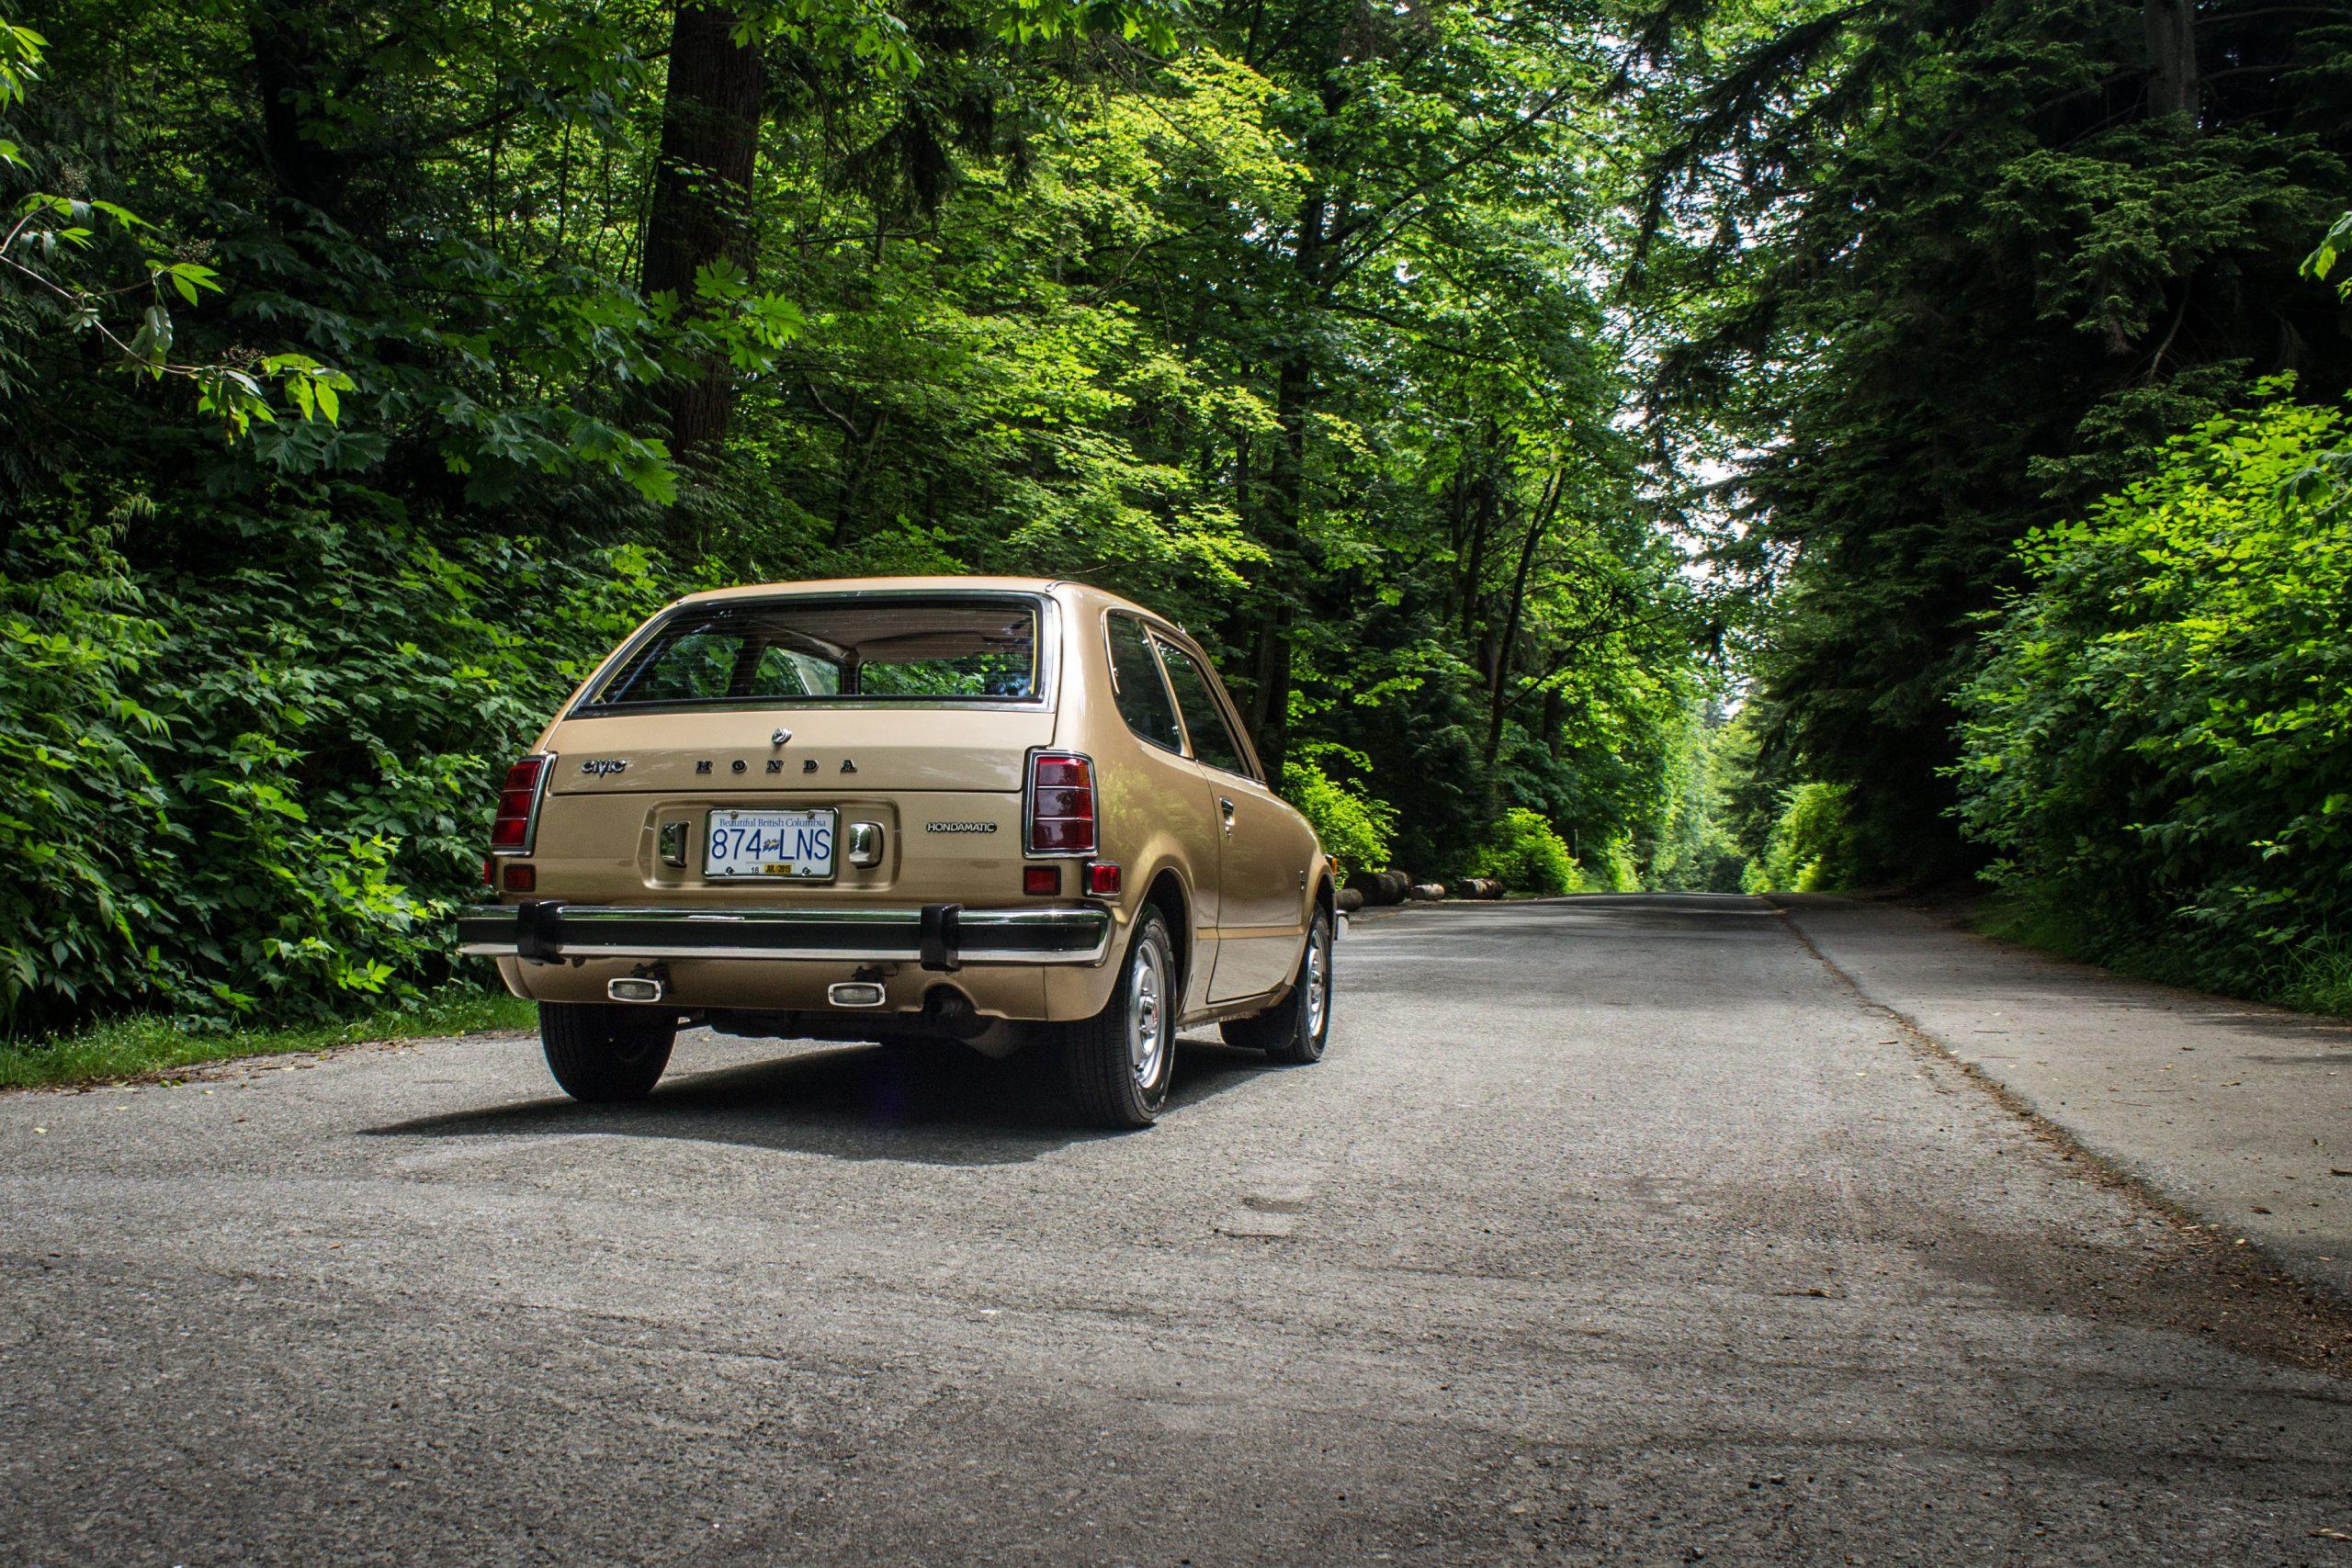 1977 Honda Civic Hatchback Rear Three-Quarter